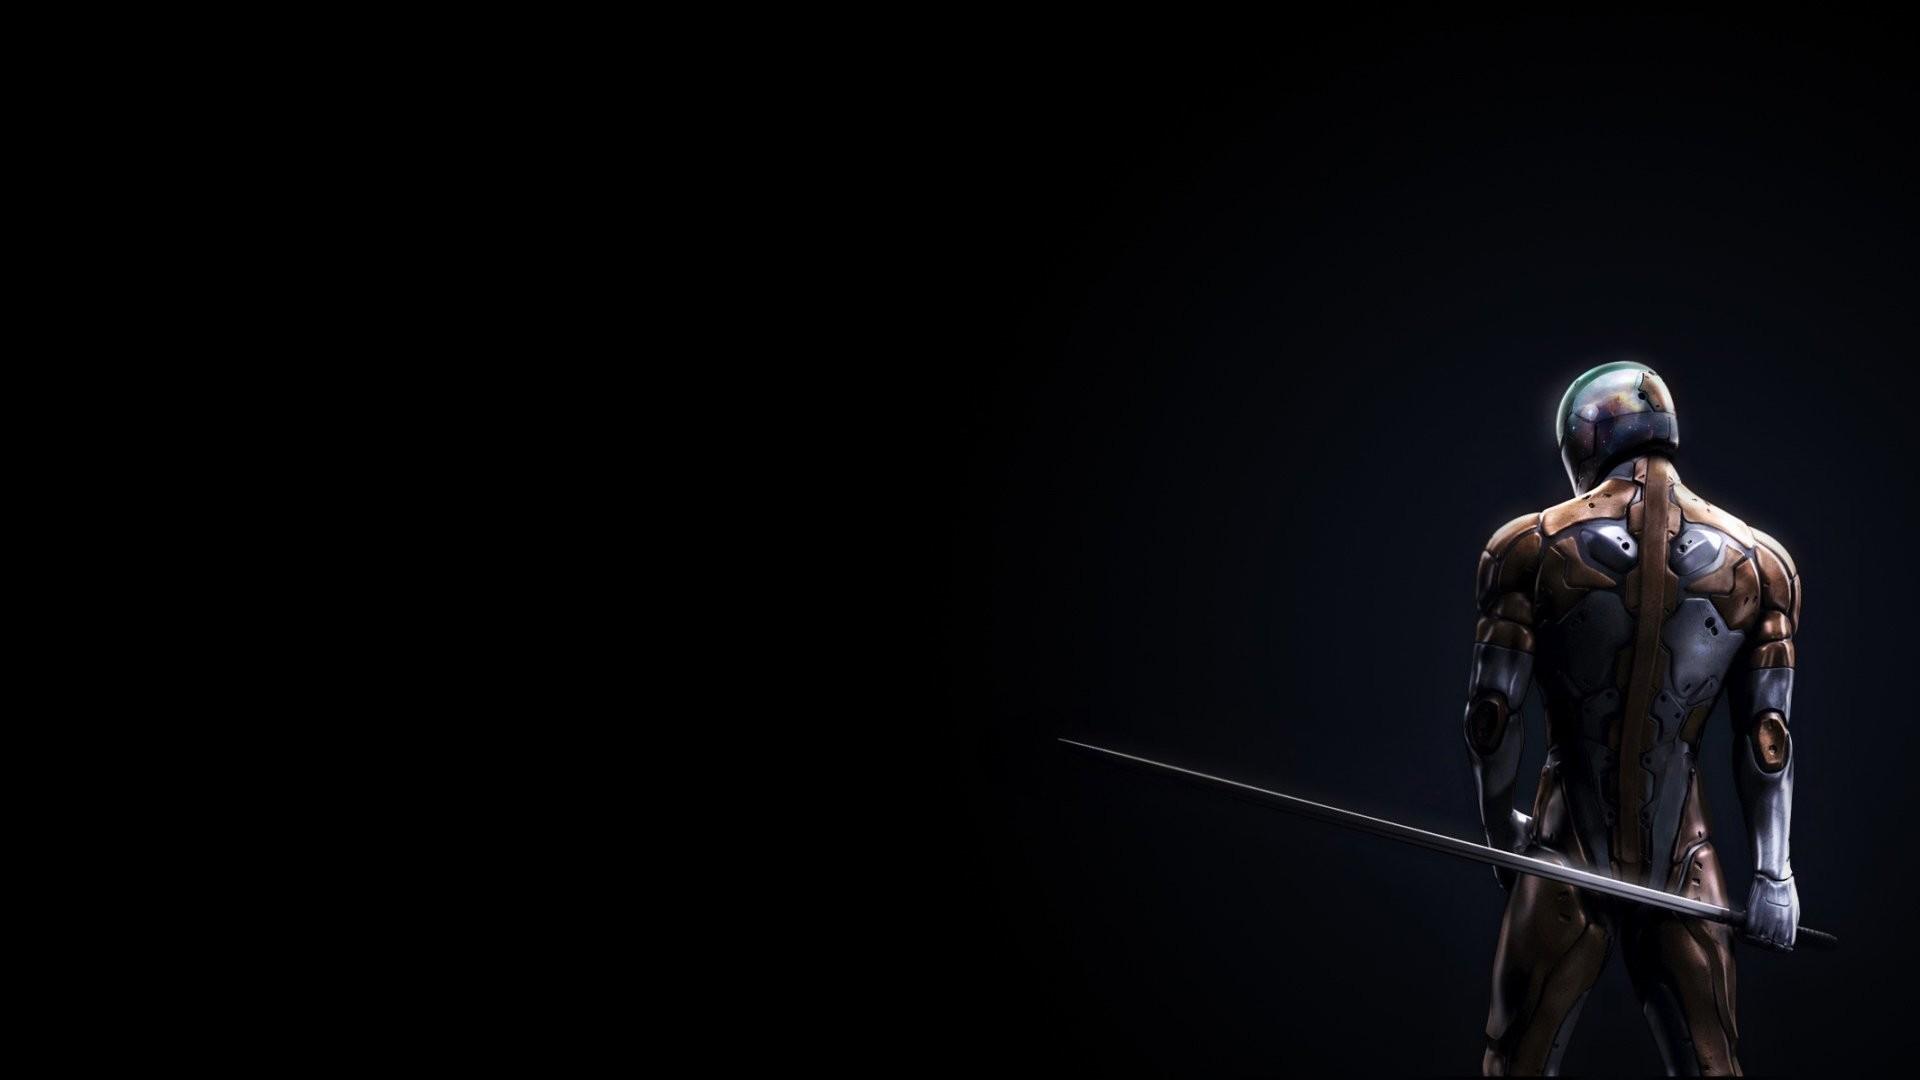 Res: 1920x1080, Computerspiele - Metal Gear Solid Gray Fox (Metal Gear Solid) Wallpaper